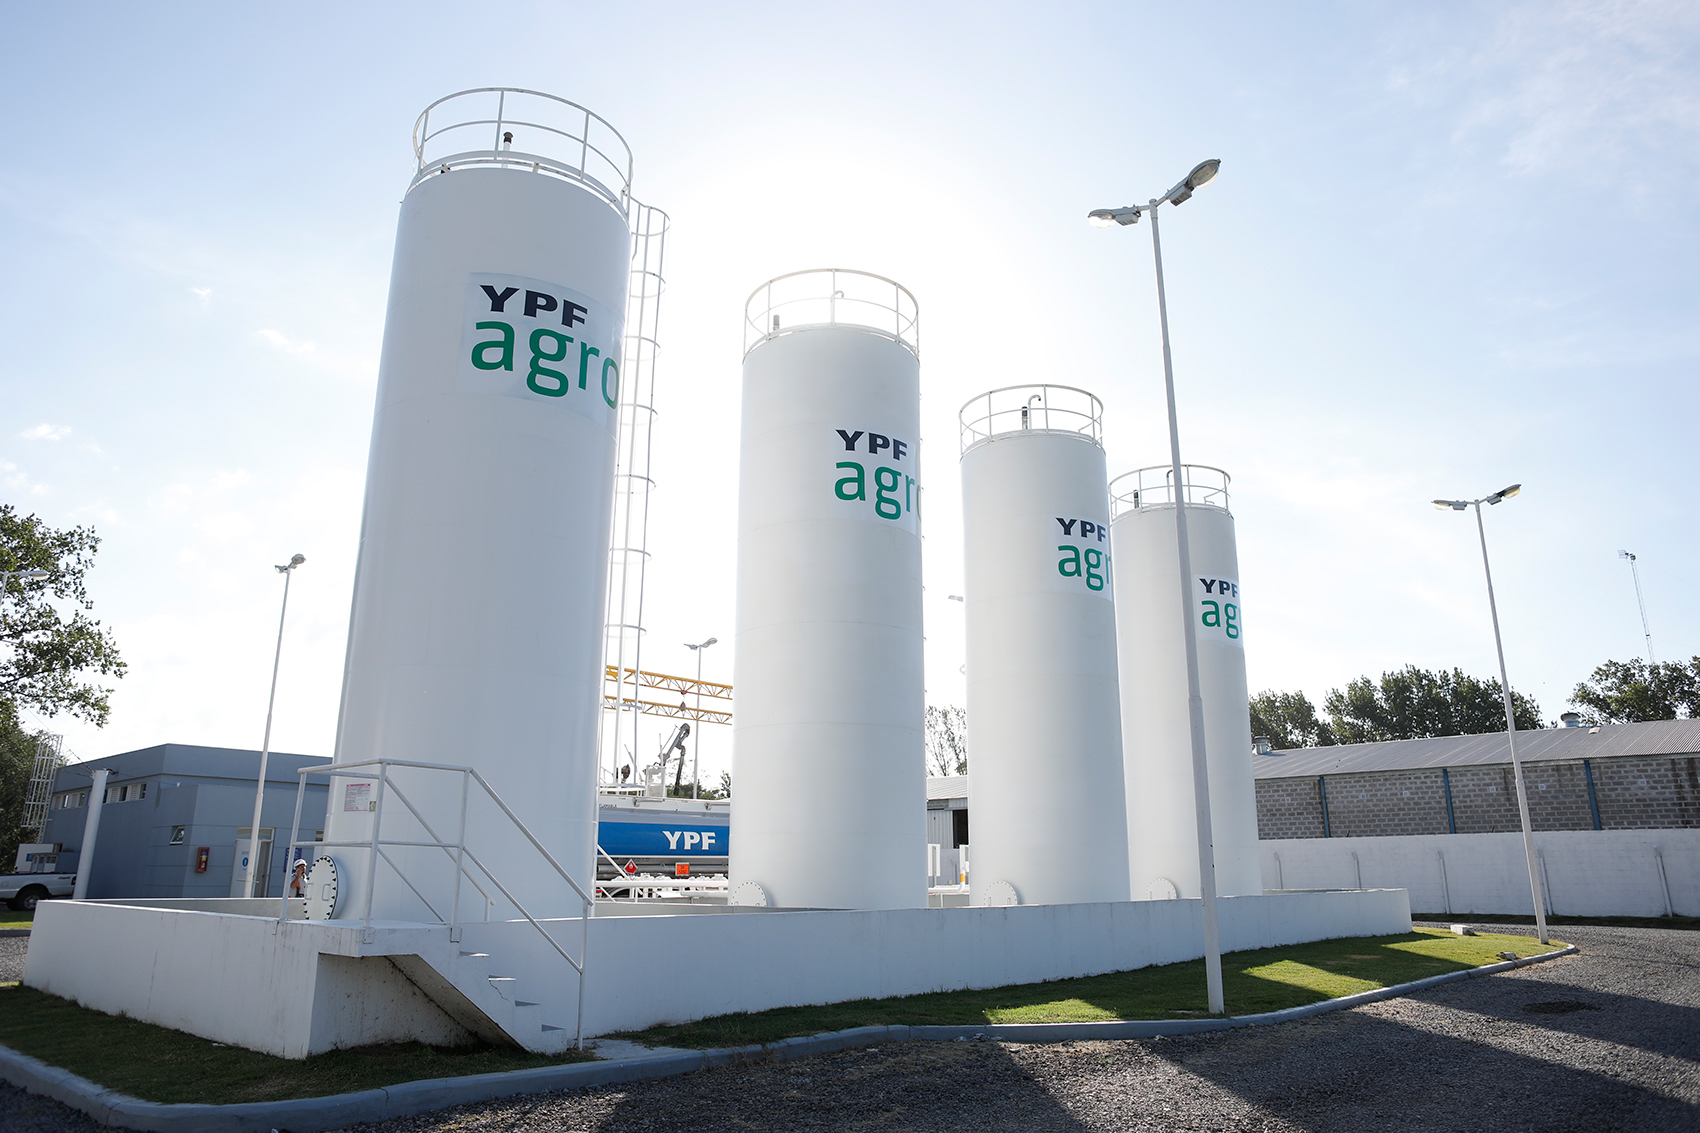 https://www.expoagro.com.ar/wp-content/uploads/Expoagro-en-La-Rural-de-Corrientes-2019-La-energi%CC%81a-de-YPF-Agro-llega-al-norte-argentino.jpg